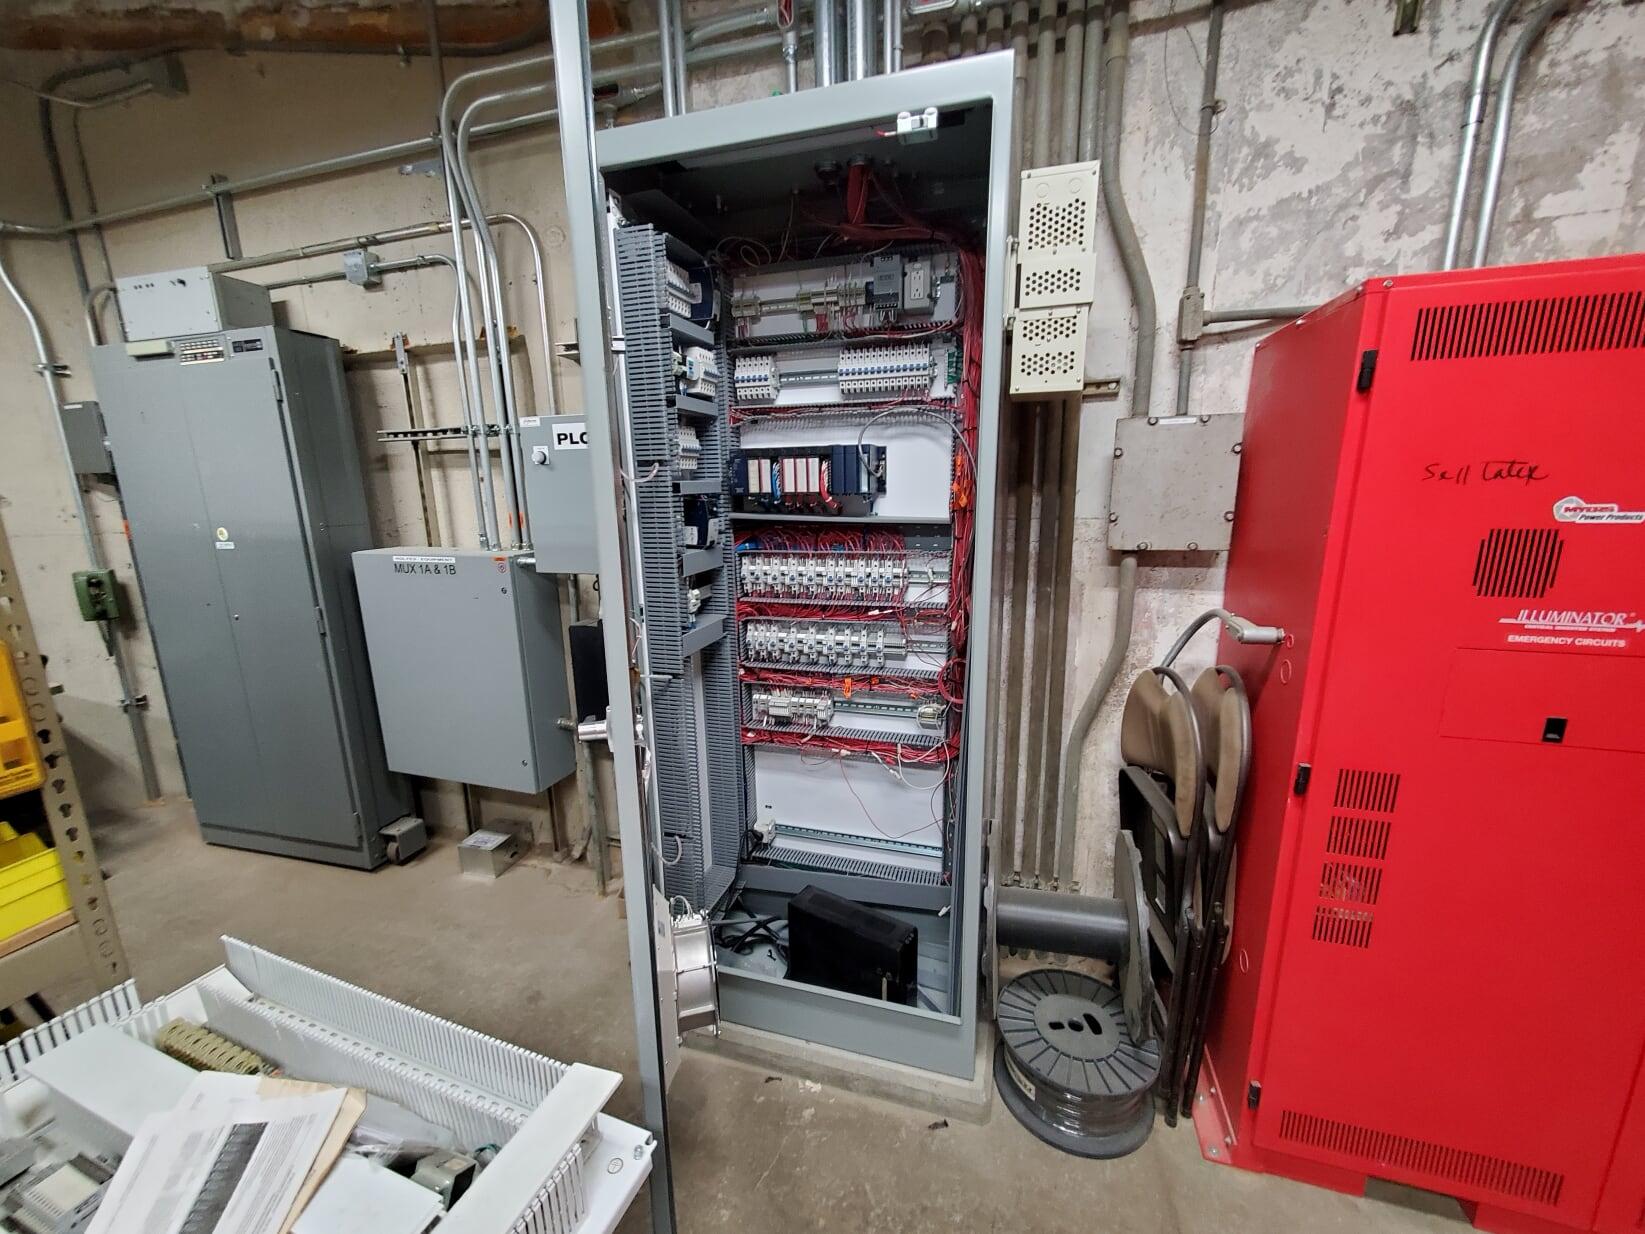 PLC Cabinet - Image 2 of 2